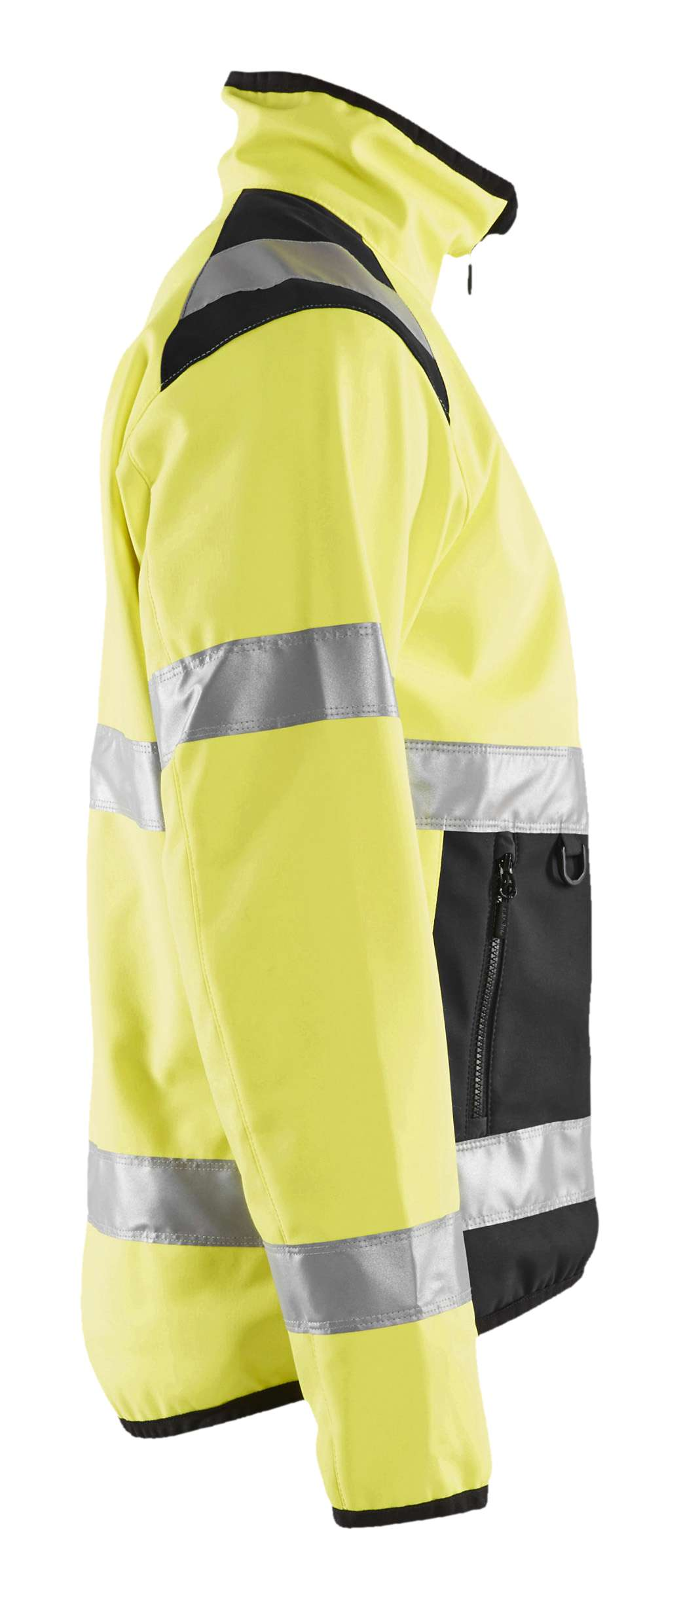 Blaklader Softshell jacks 48772516 High Vis geel-zwart(3399)